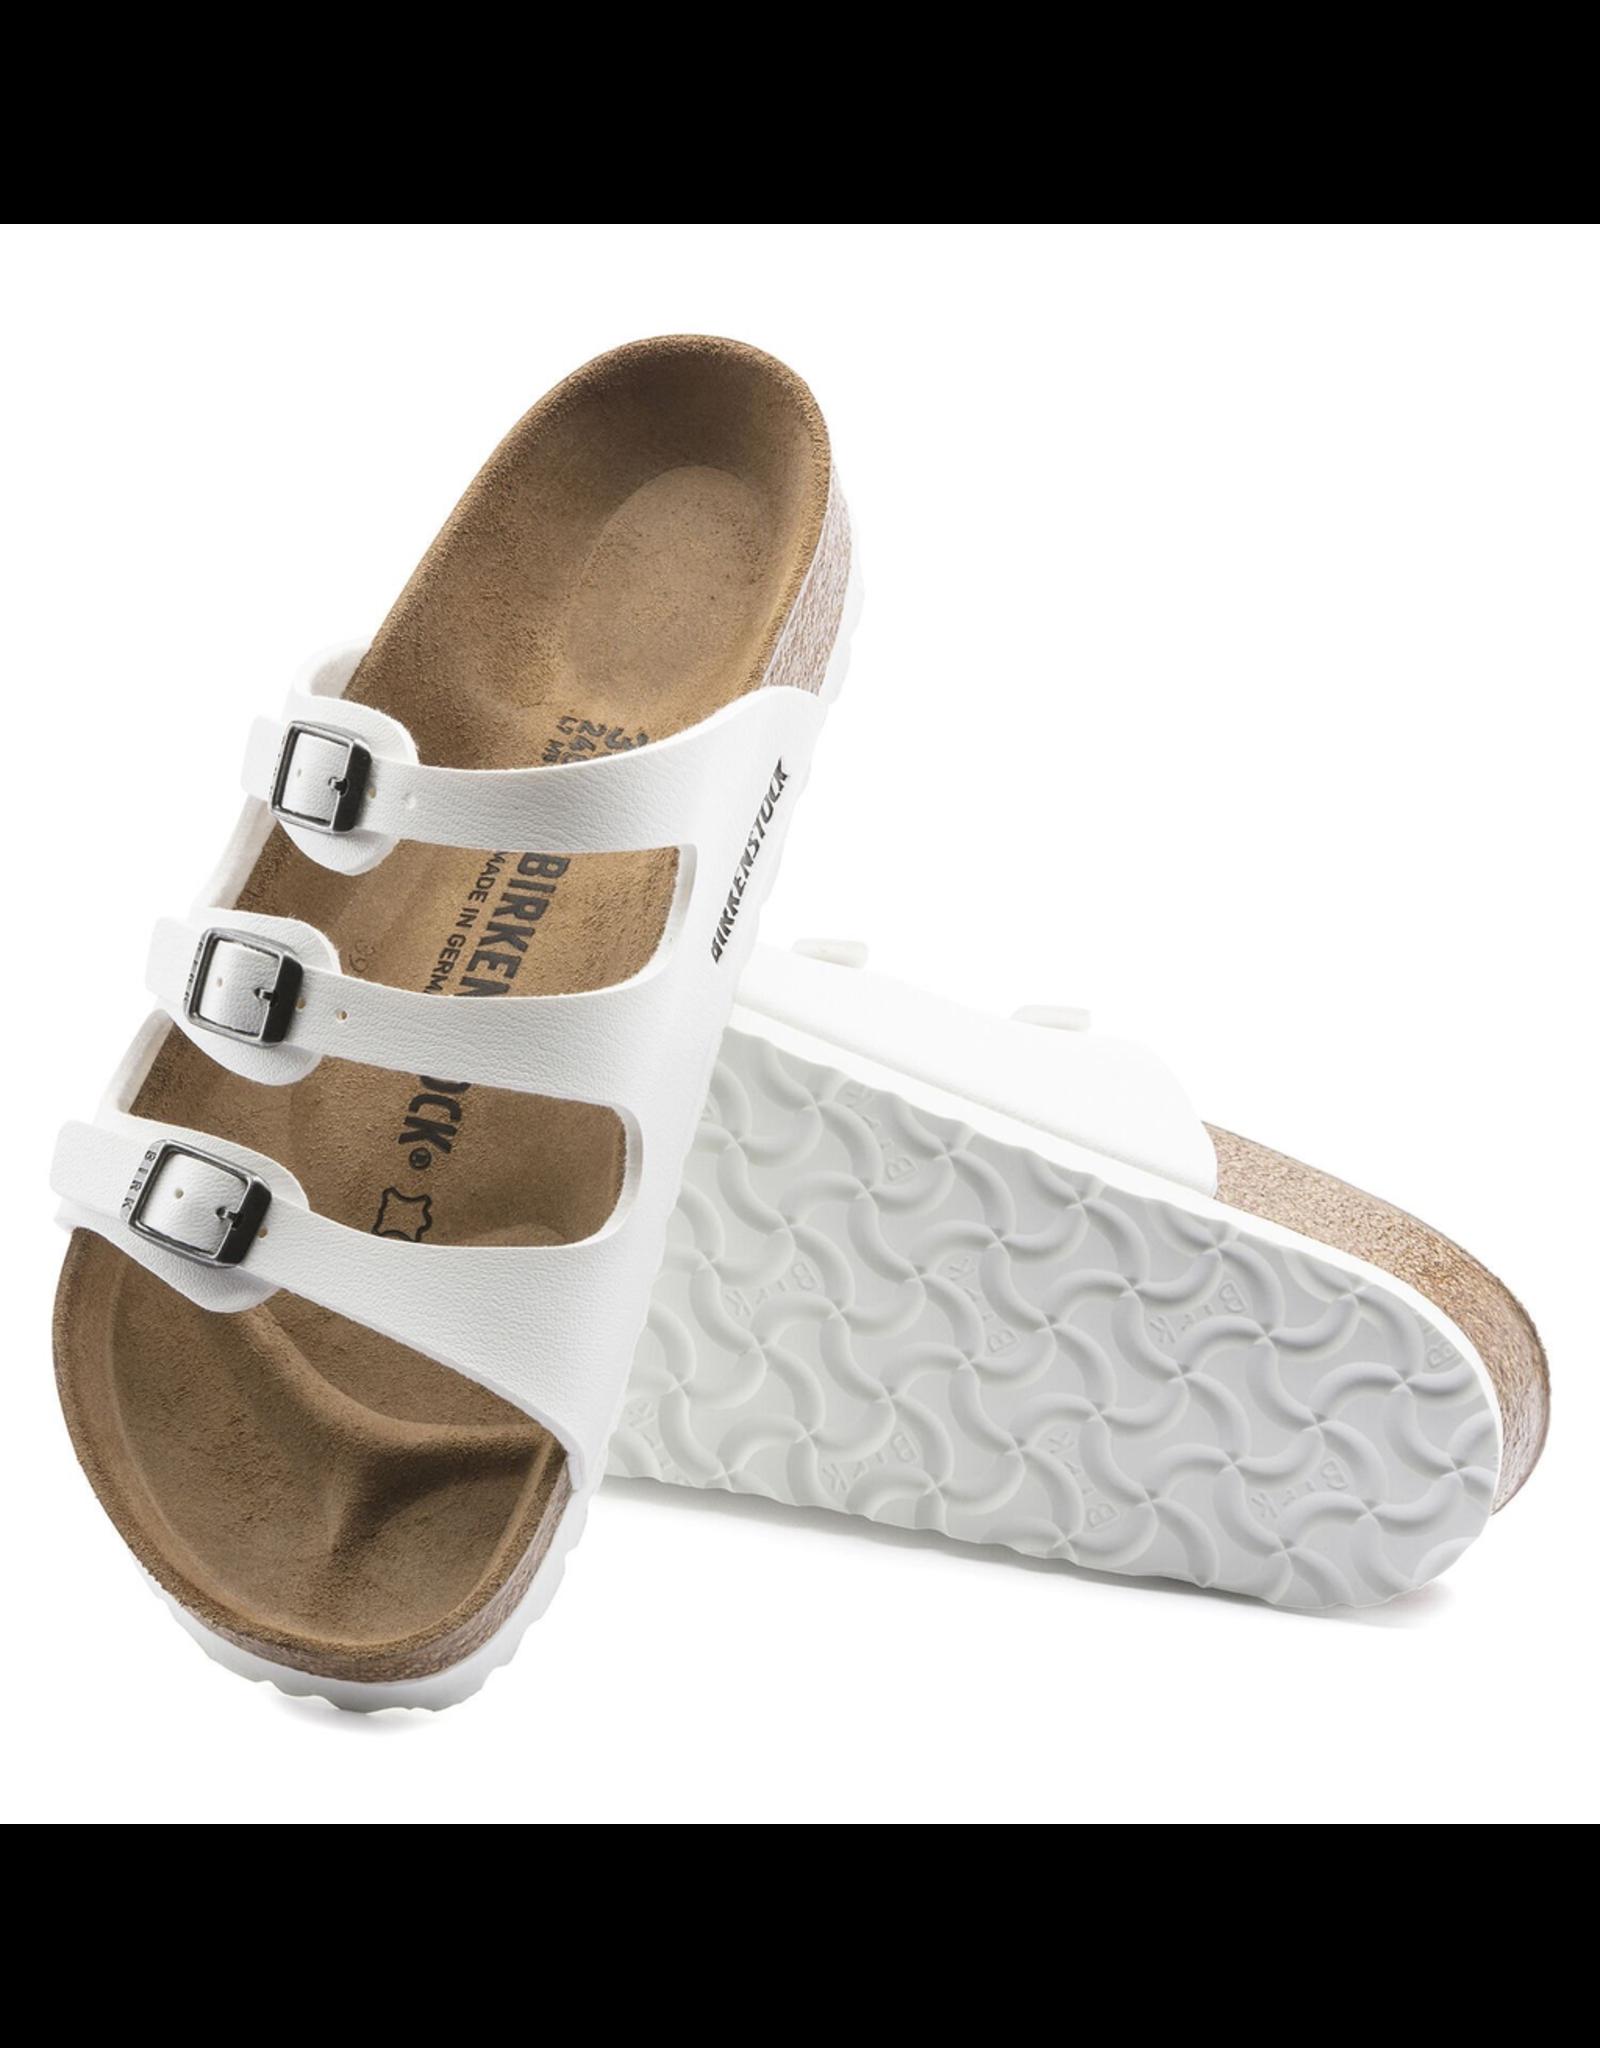 Birkenstock Florida Sandal Birko-Flor